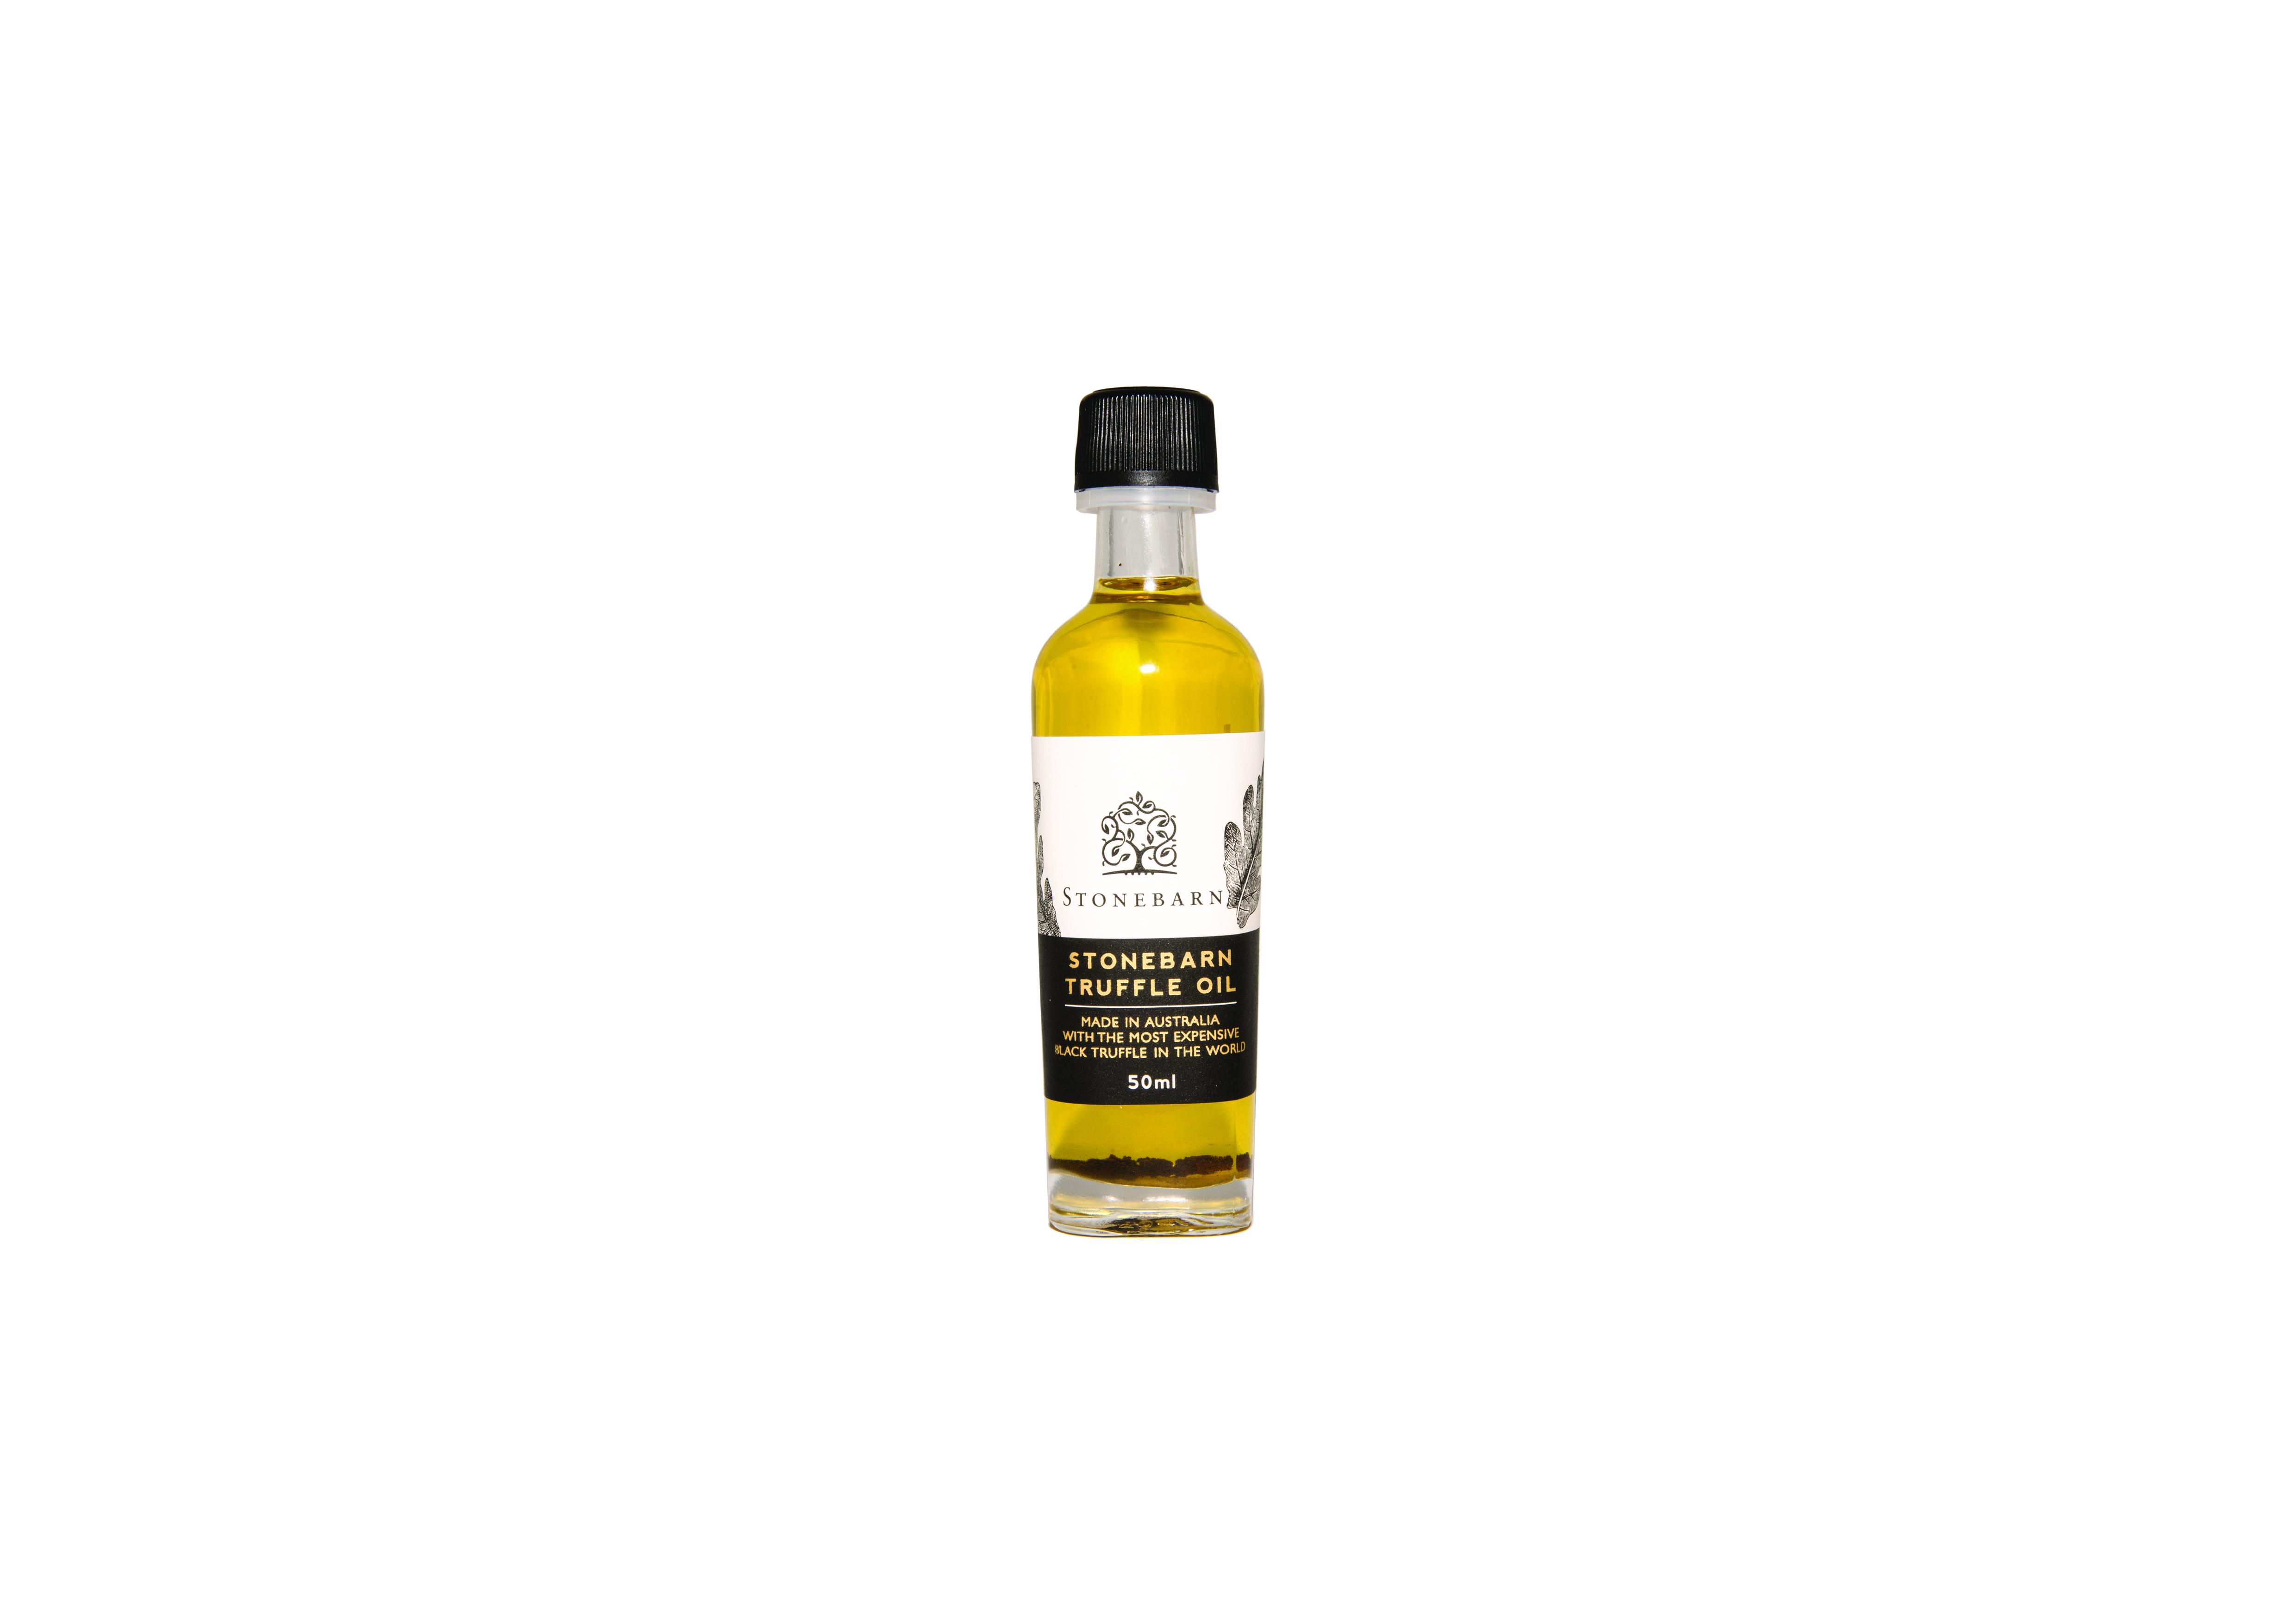 Stonebarn Black Truffle Oil 50ml